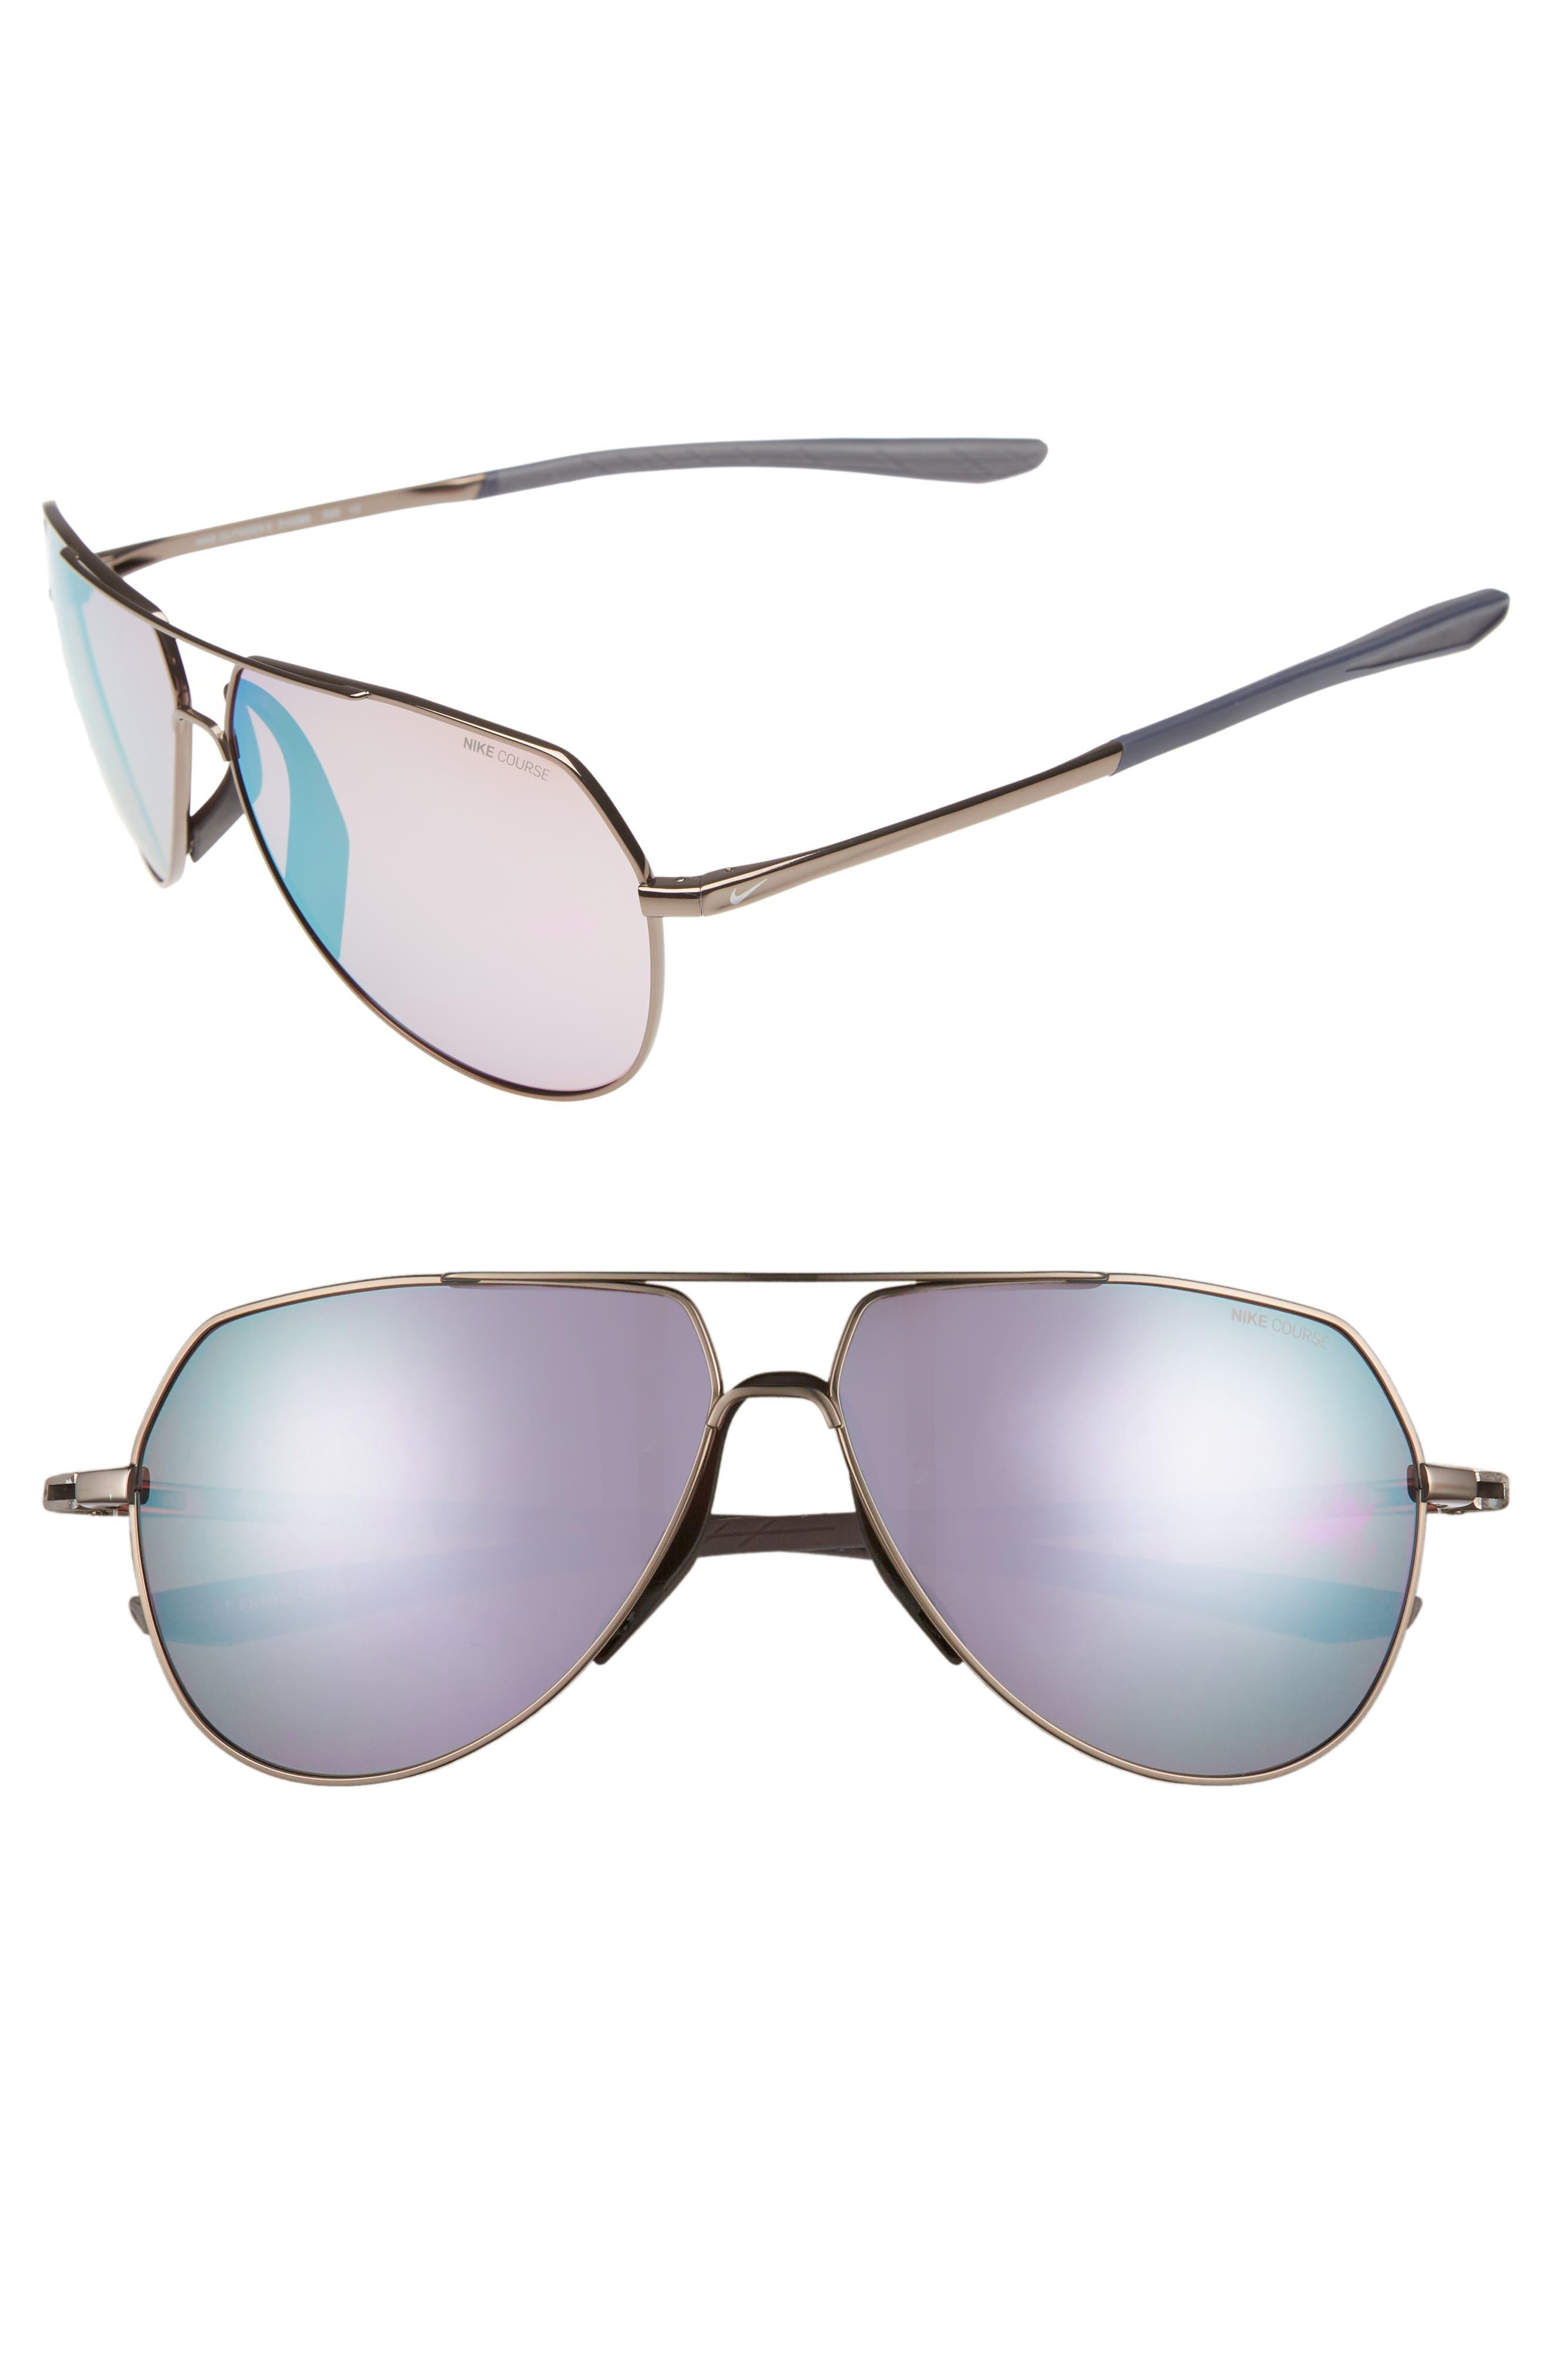 Outrider E 62mm Oversize Aviator Sunglasses,                         Main,                         color, PEWTER/ GOLF MILKY BLUE